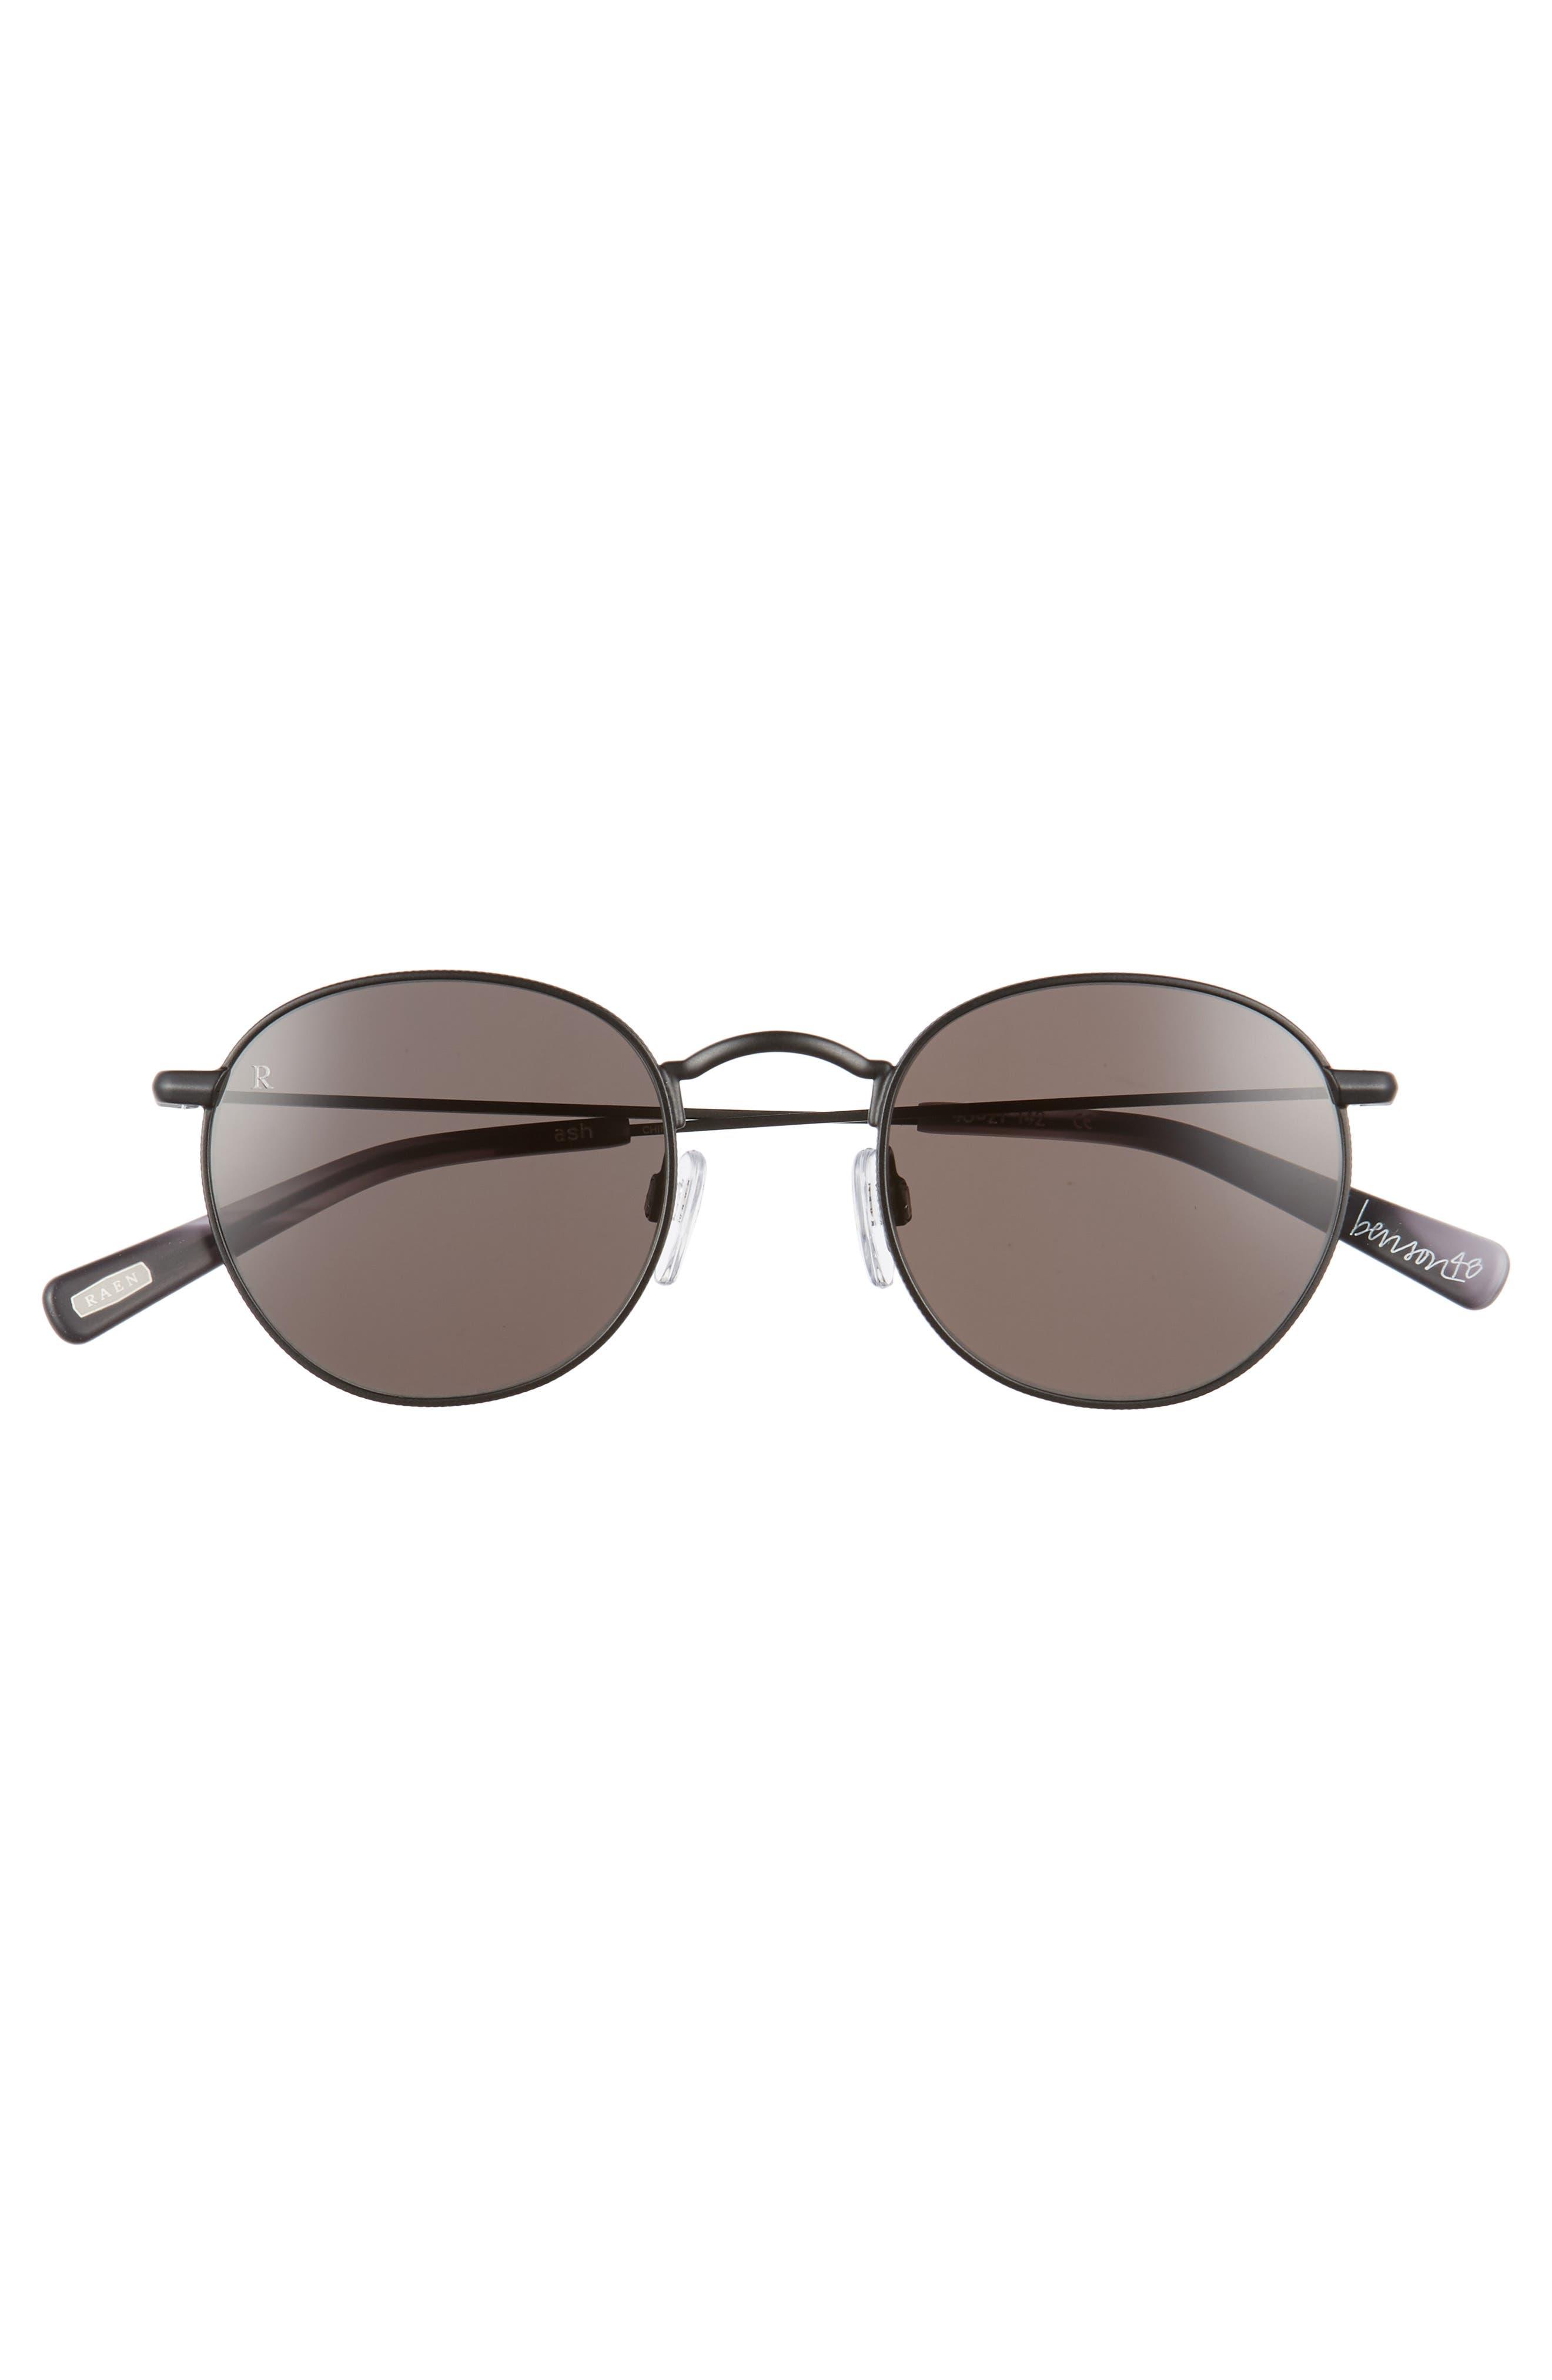 Benson 48mm Sunglasses,                             Alternate thumbnail 2, color,                             ASH